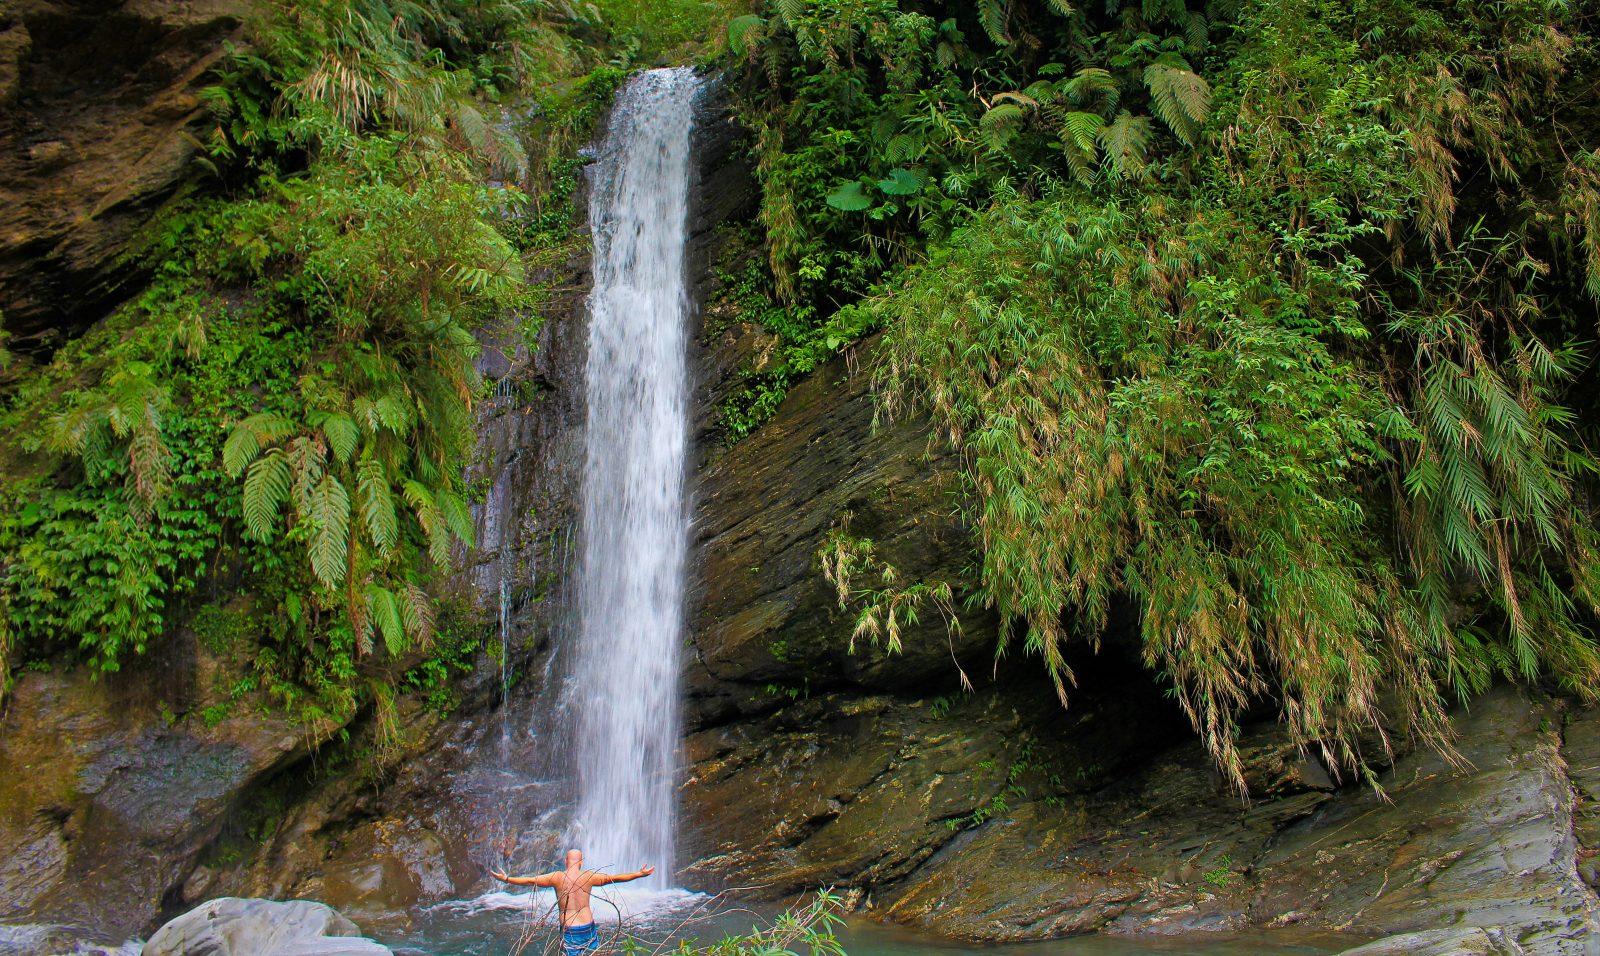 Mugua River Gorge: Waterfalls & Swimming Holes Adventure